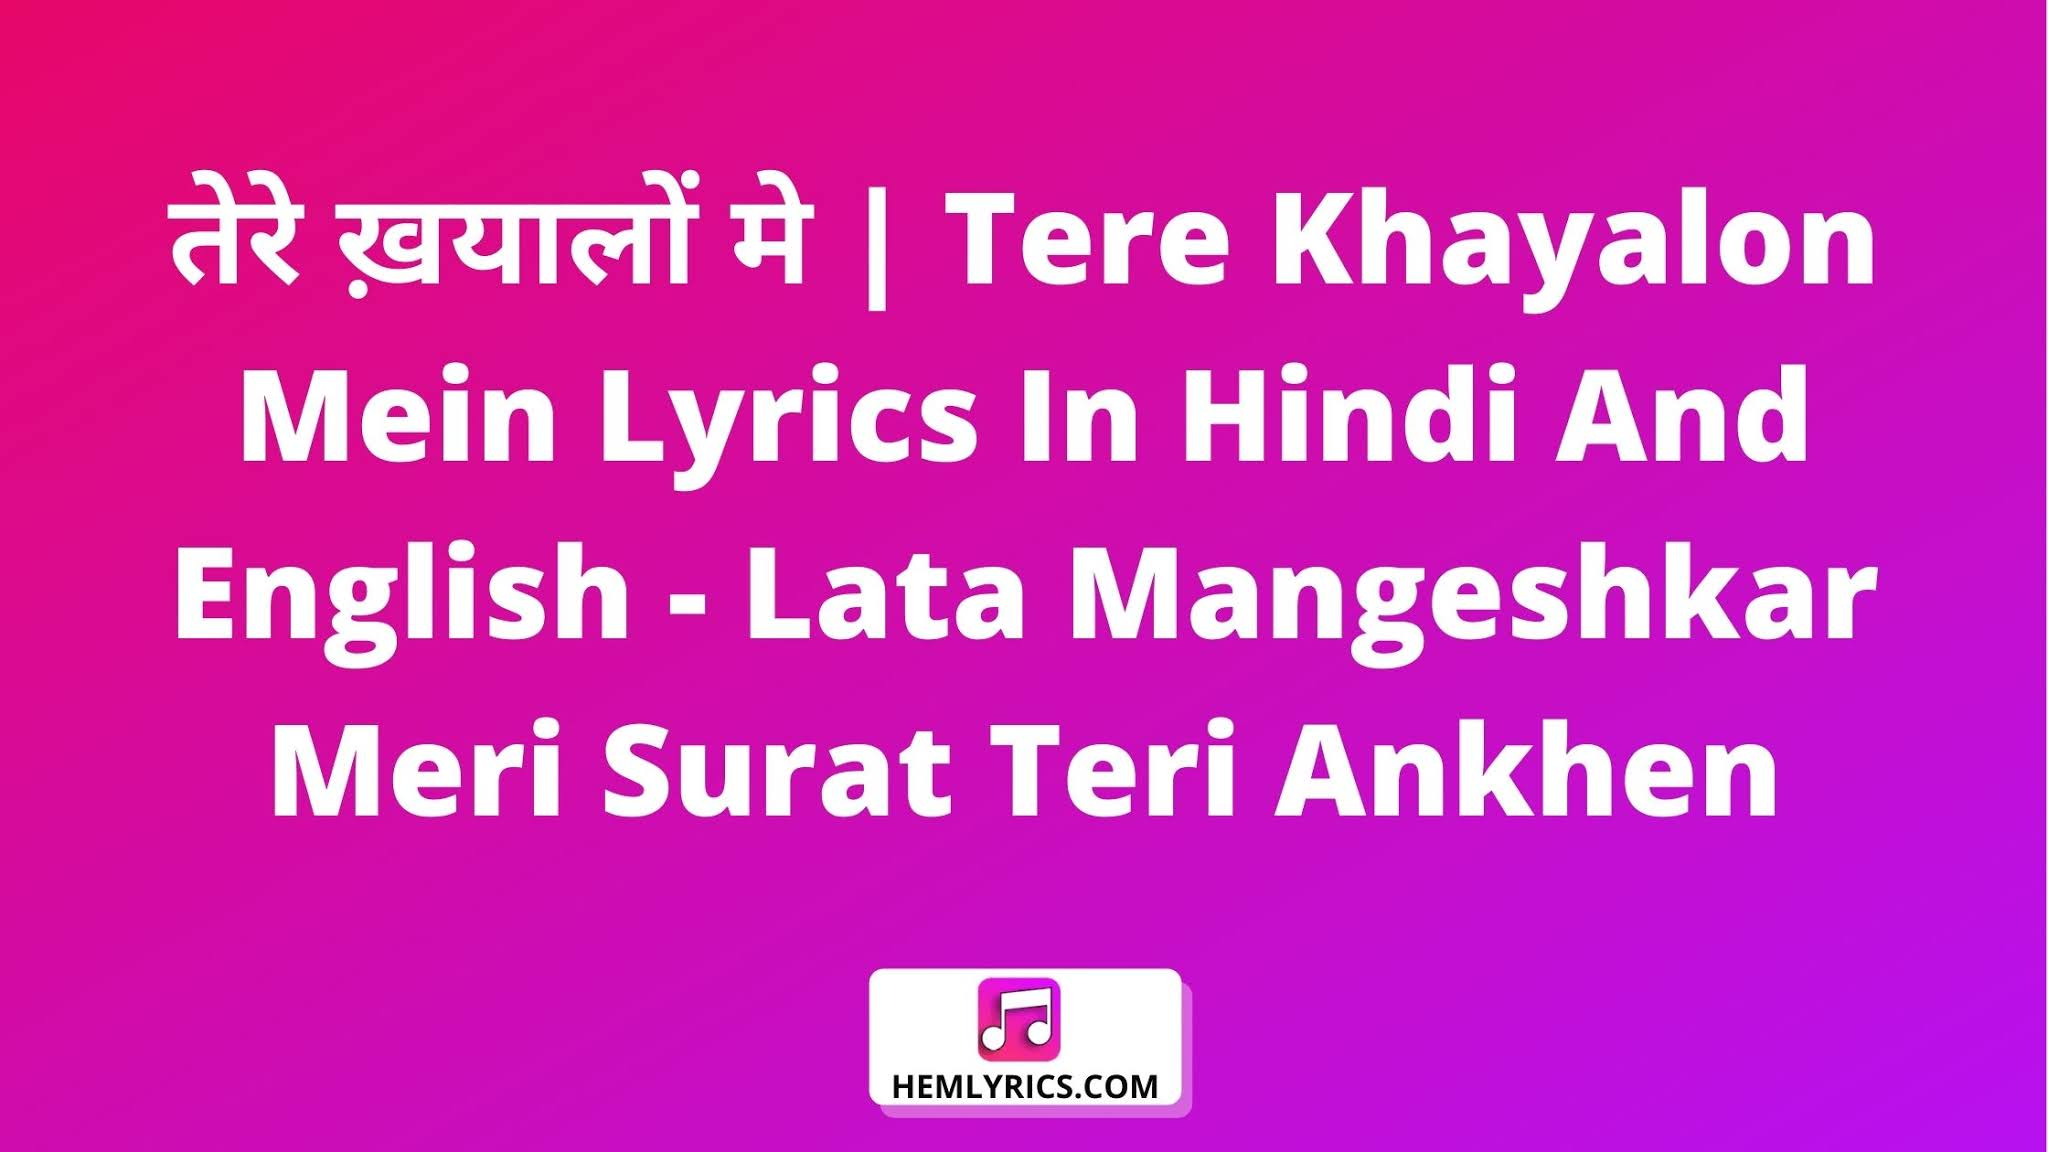 तेरे ख़यालों मे | Tere Khayalon Mein Lyrics In Hindi And English - Lata Mangeshkar | Meri Surat Teri Ankhen